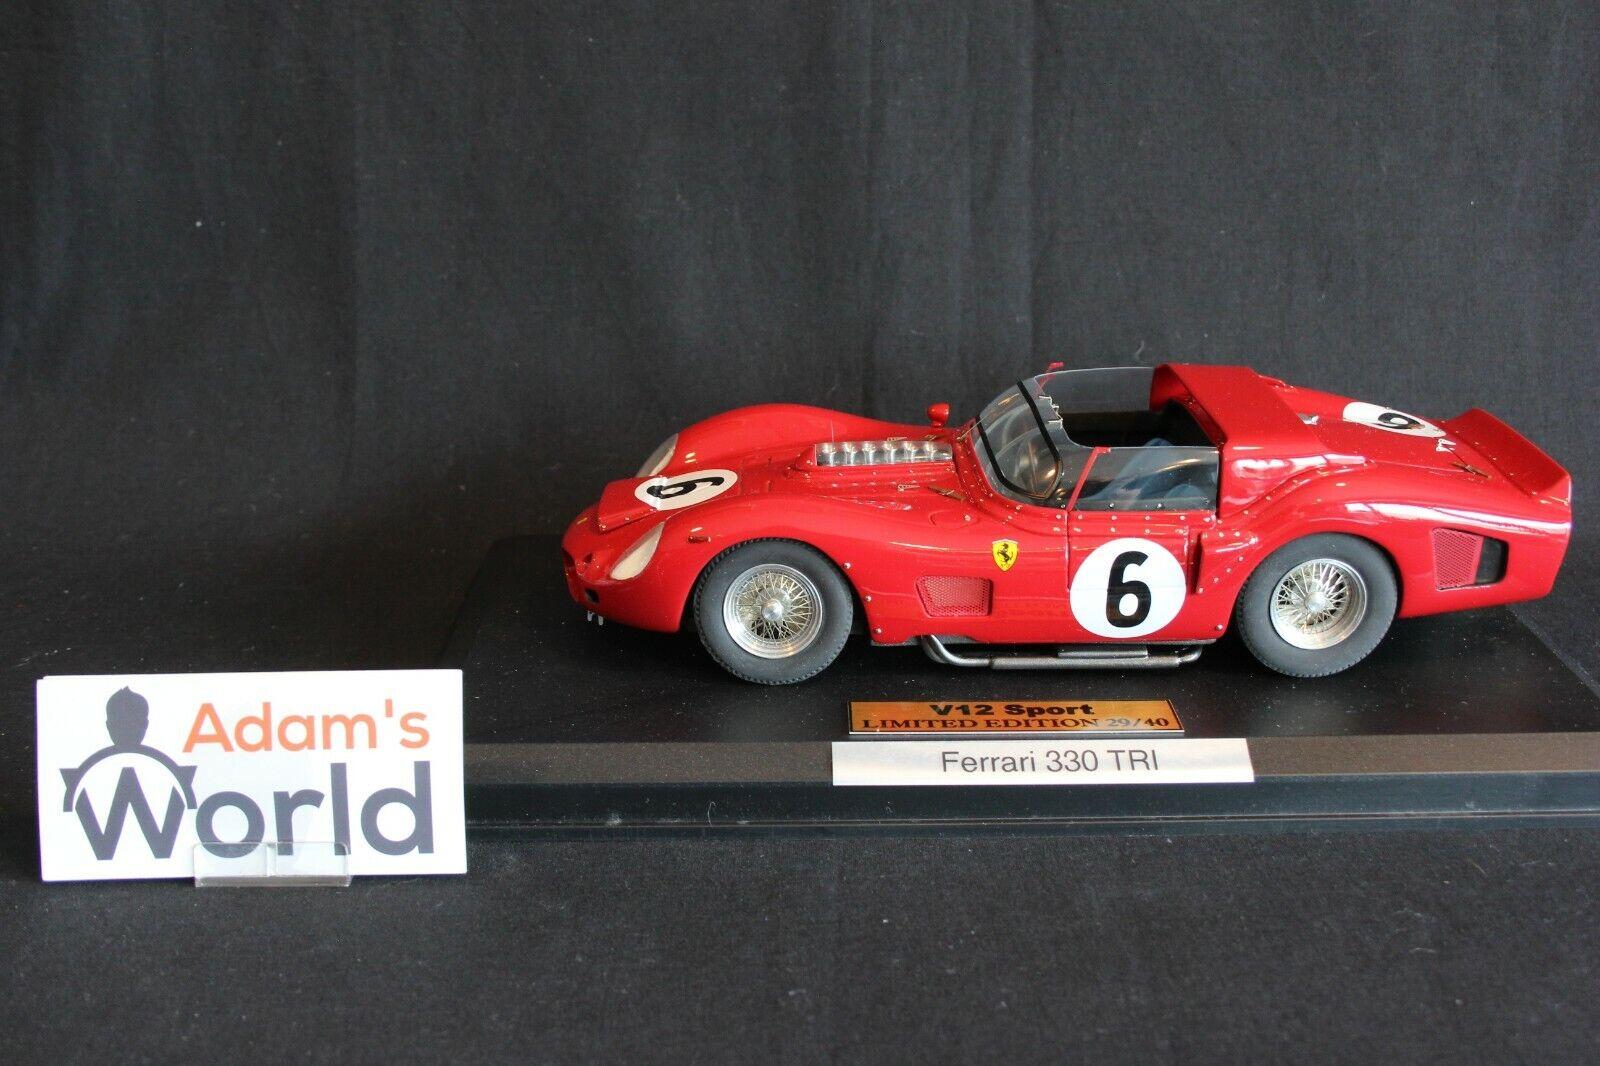 V12 Sport Ferrari 330 TRI 1 18 Gendebien   Hill vinnare 24h LM 1962 (PJBB)